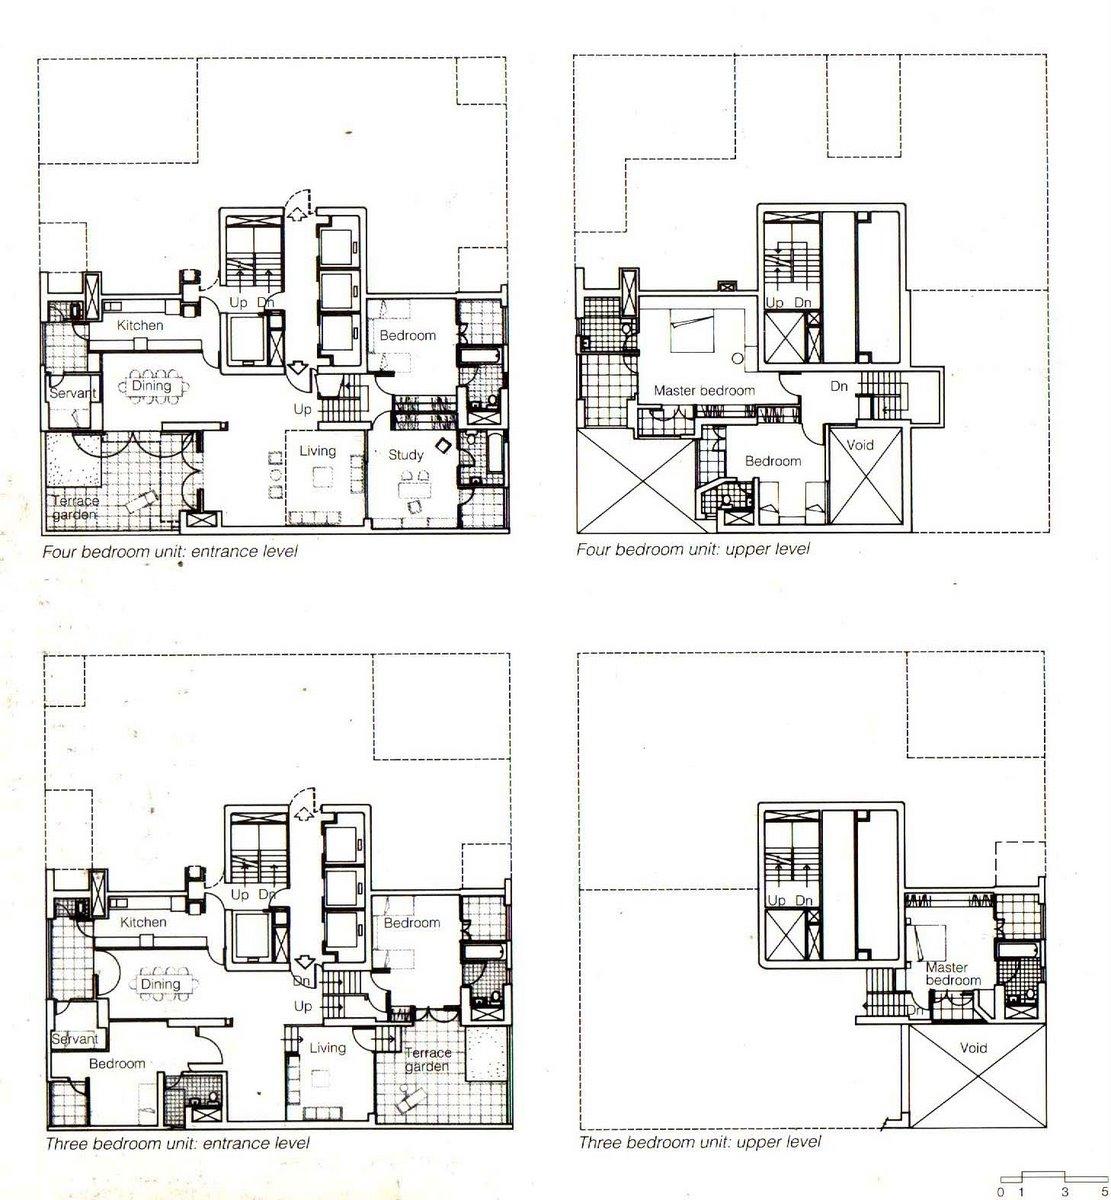 la torre kanchanjunga charles correa architectur233 plans